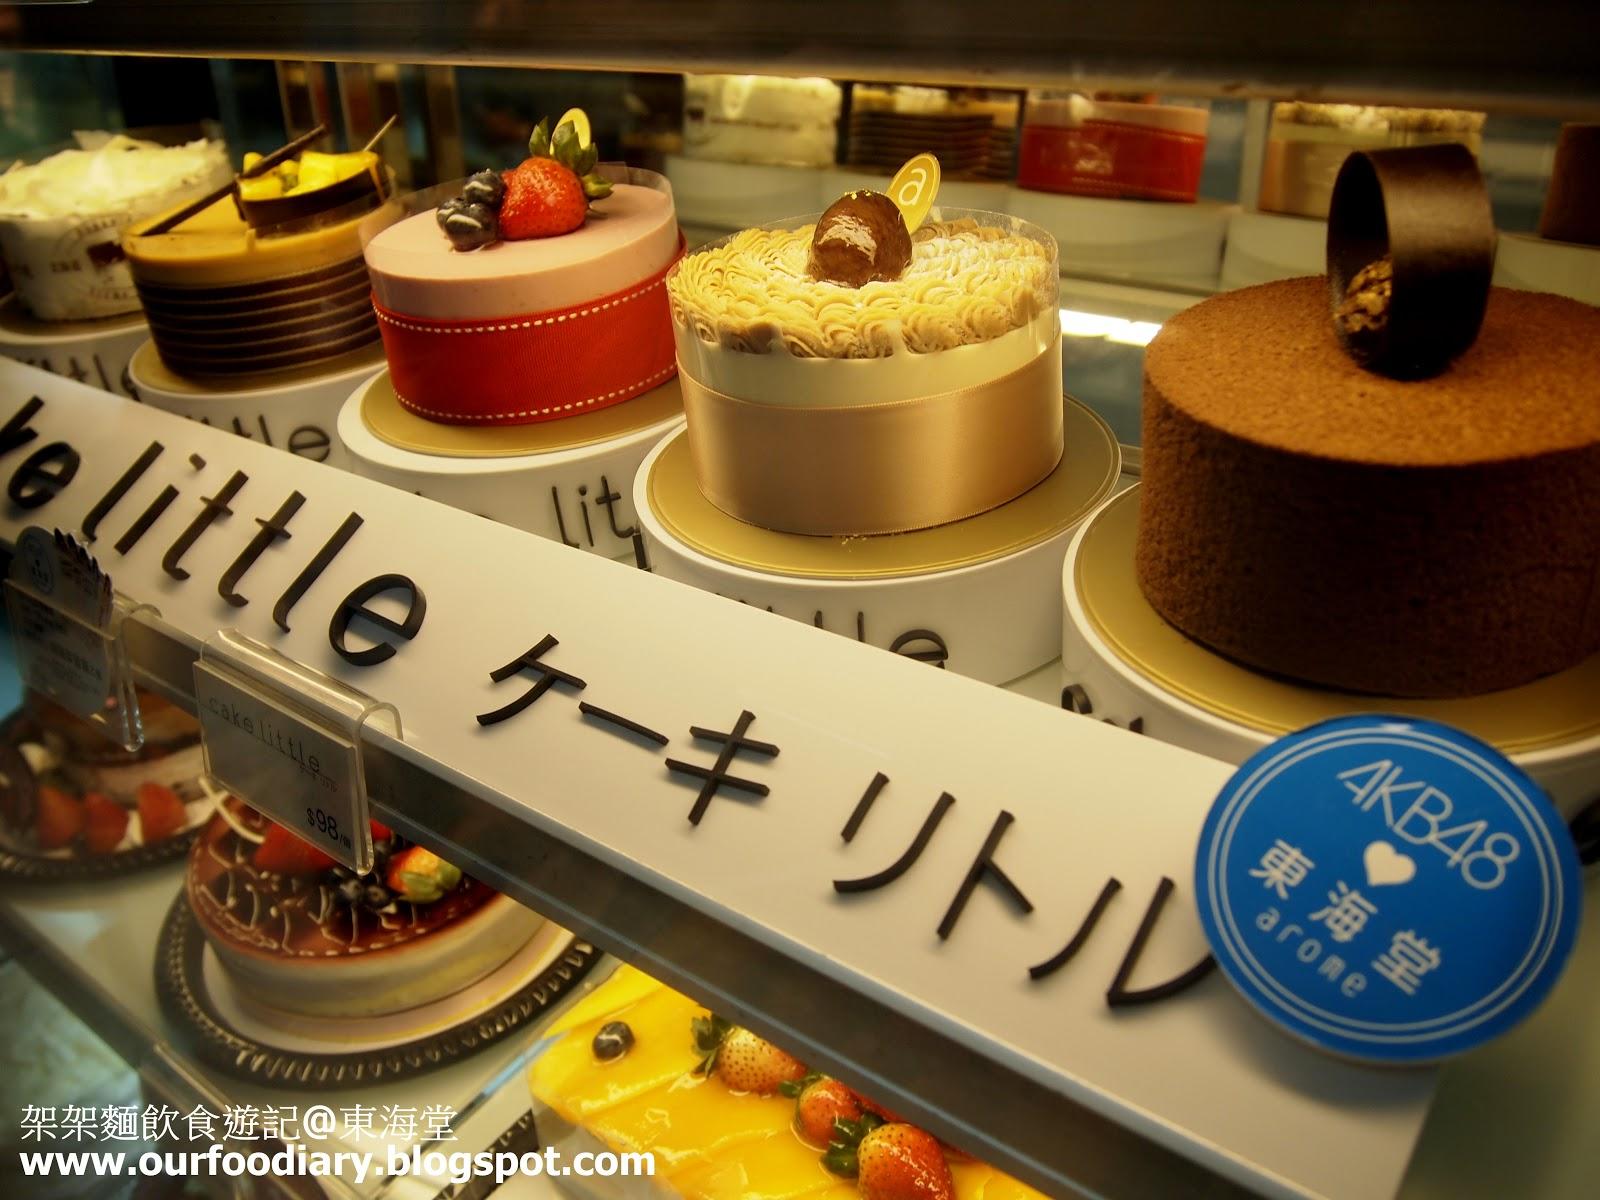 cake little@東海堂 - 飲品美食 - SeeWide